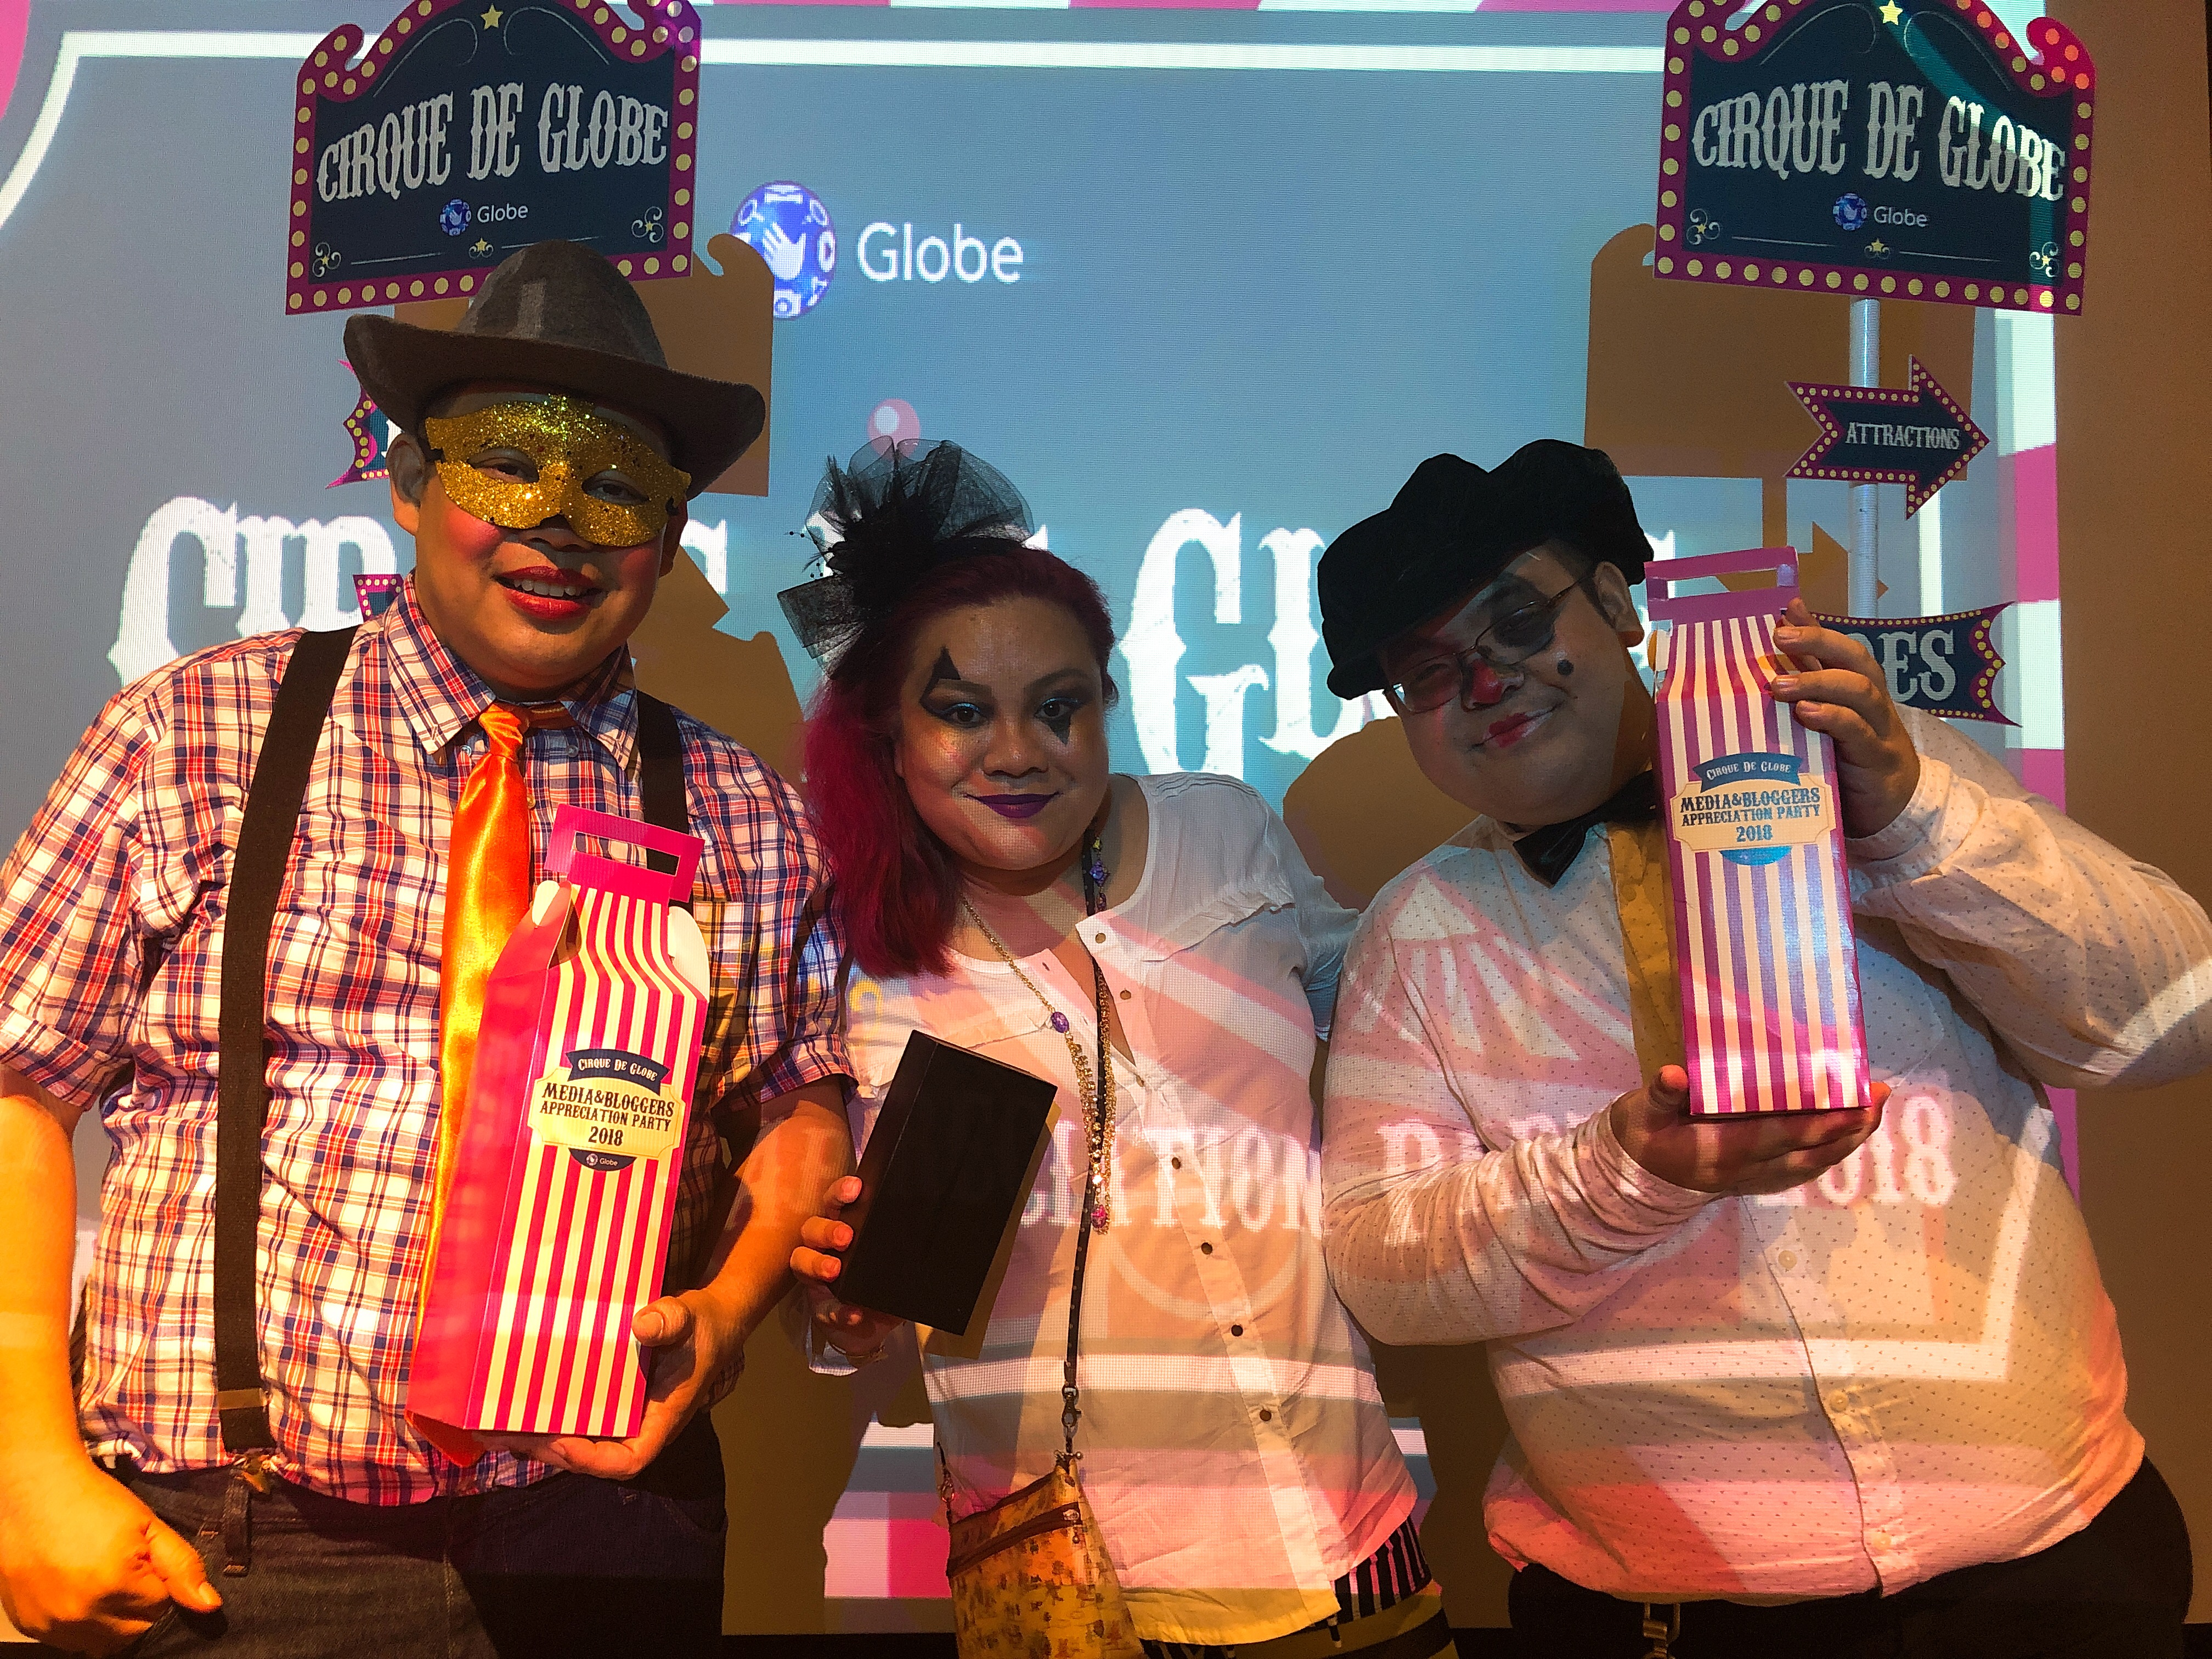 The fun Cirque de Globe CDO Globe Telecom party and my very special prize